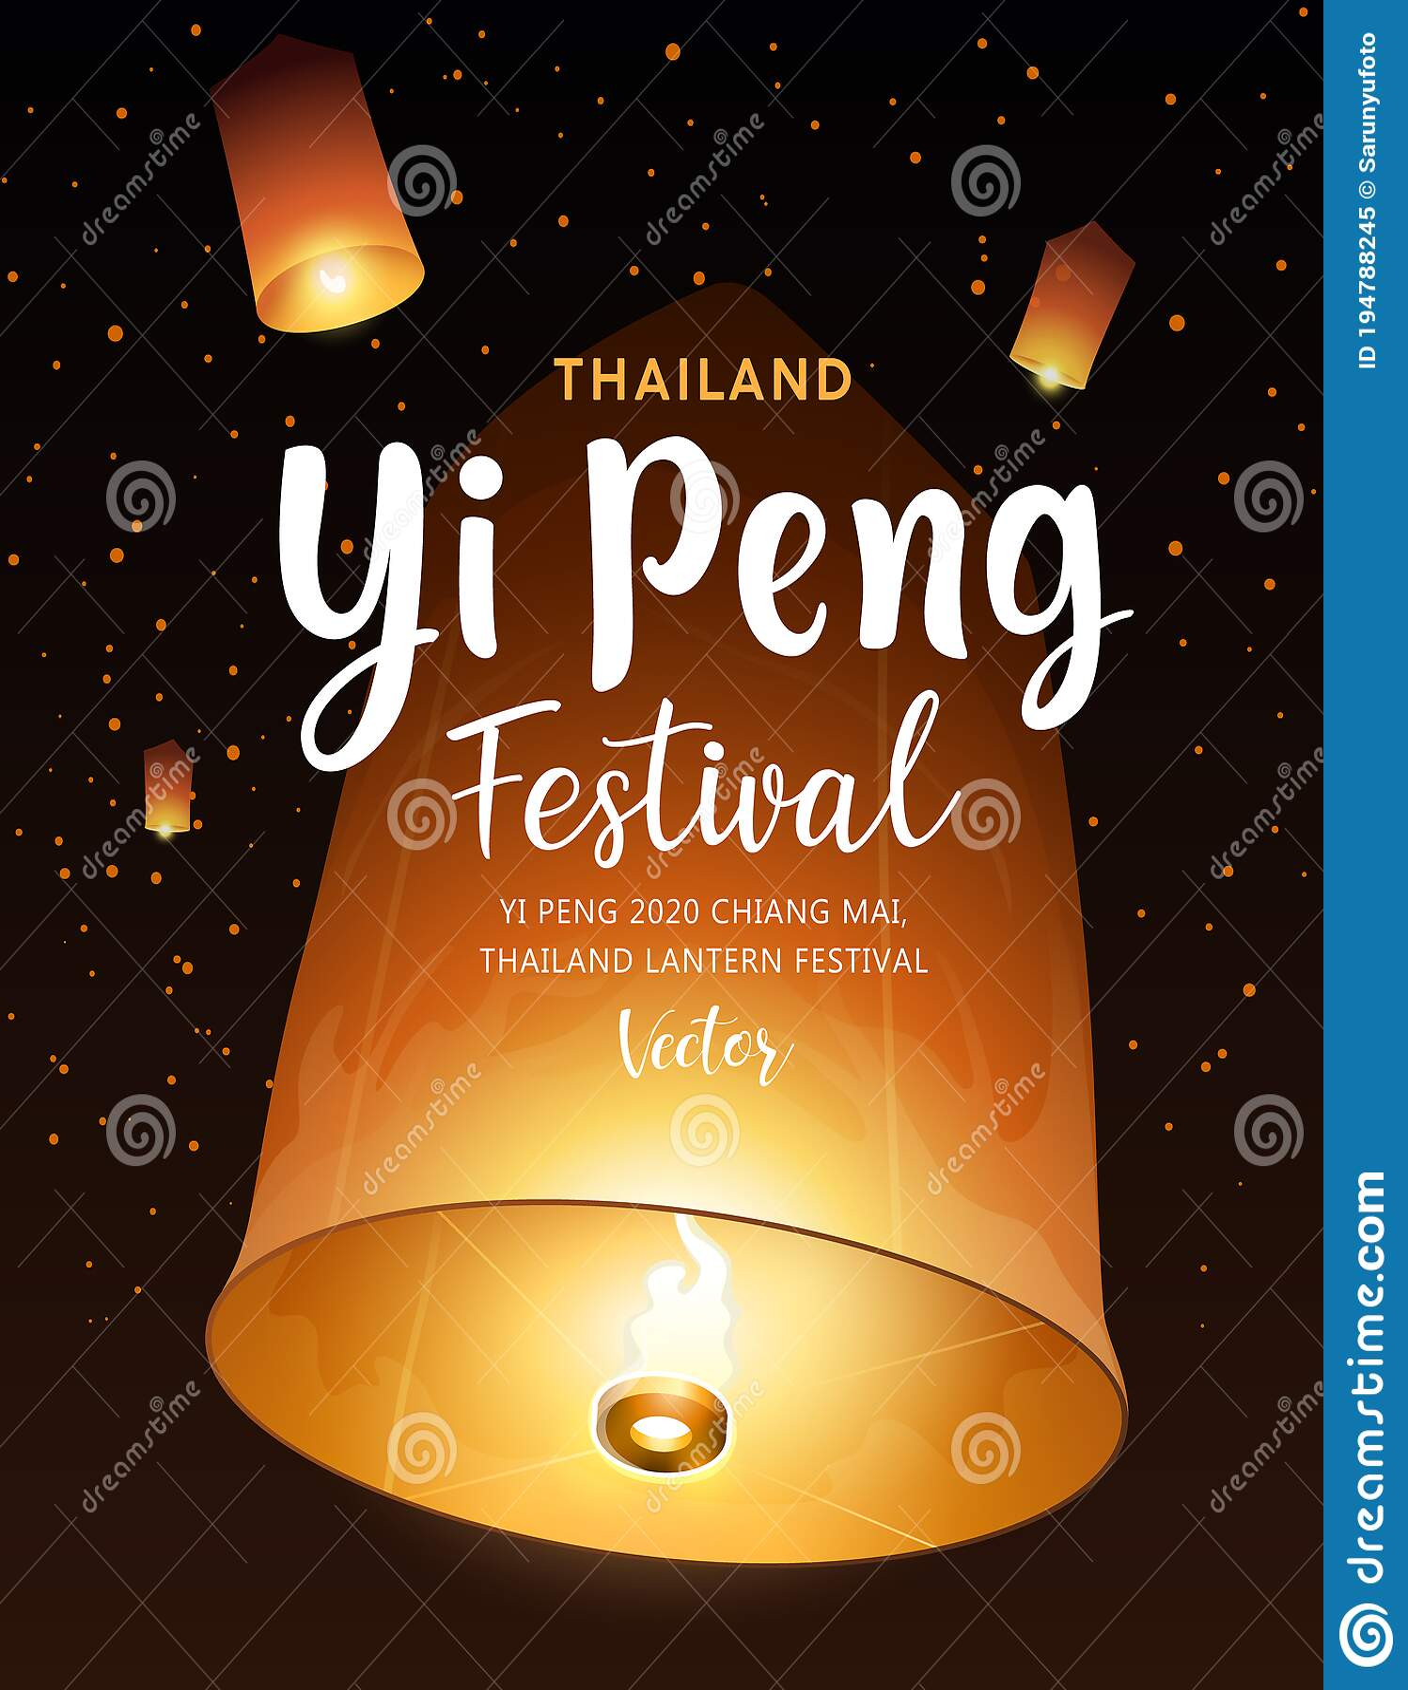 Floating Lantern Vector Yi Peng Festival Chiang Mai Thailand Lantern Festival Before Loy Krathong Poster Stock Vector Illustration Of Black Holiday 194788245